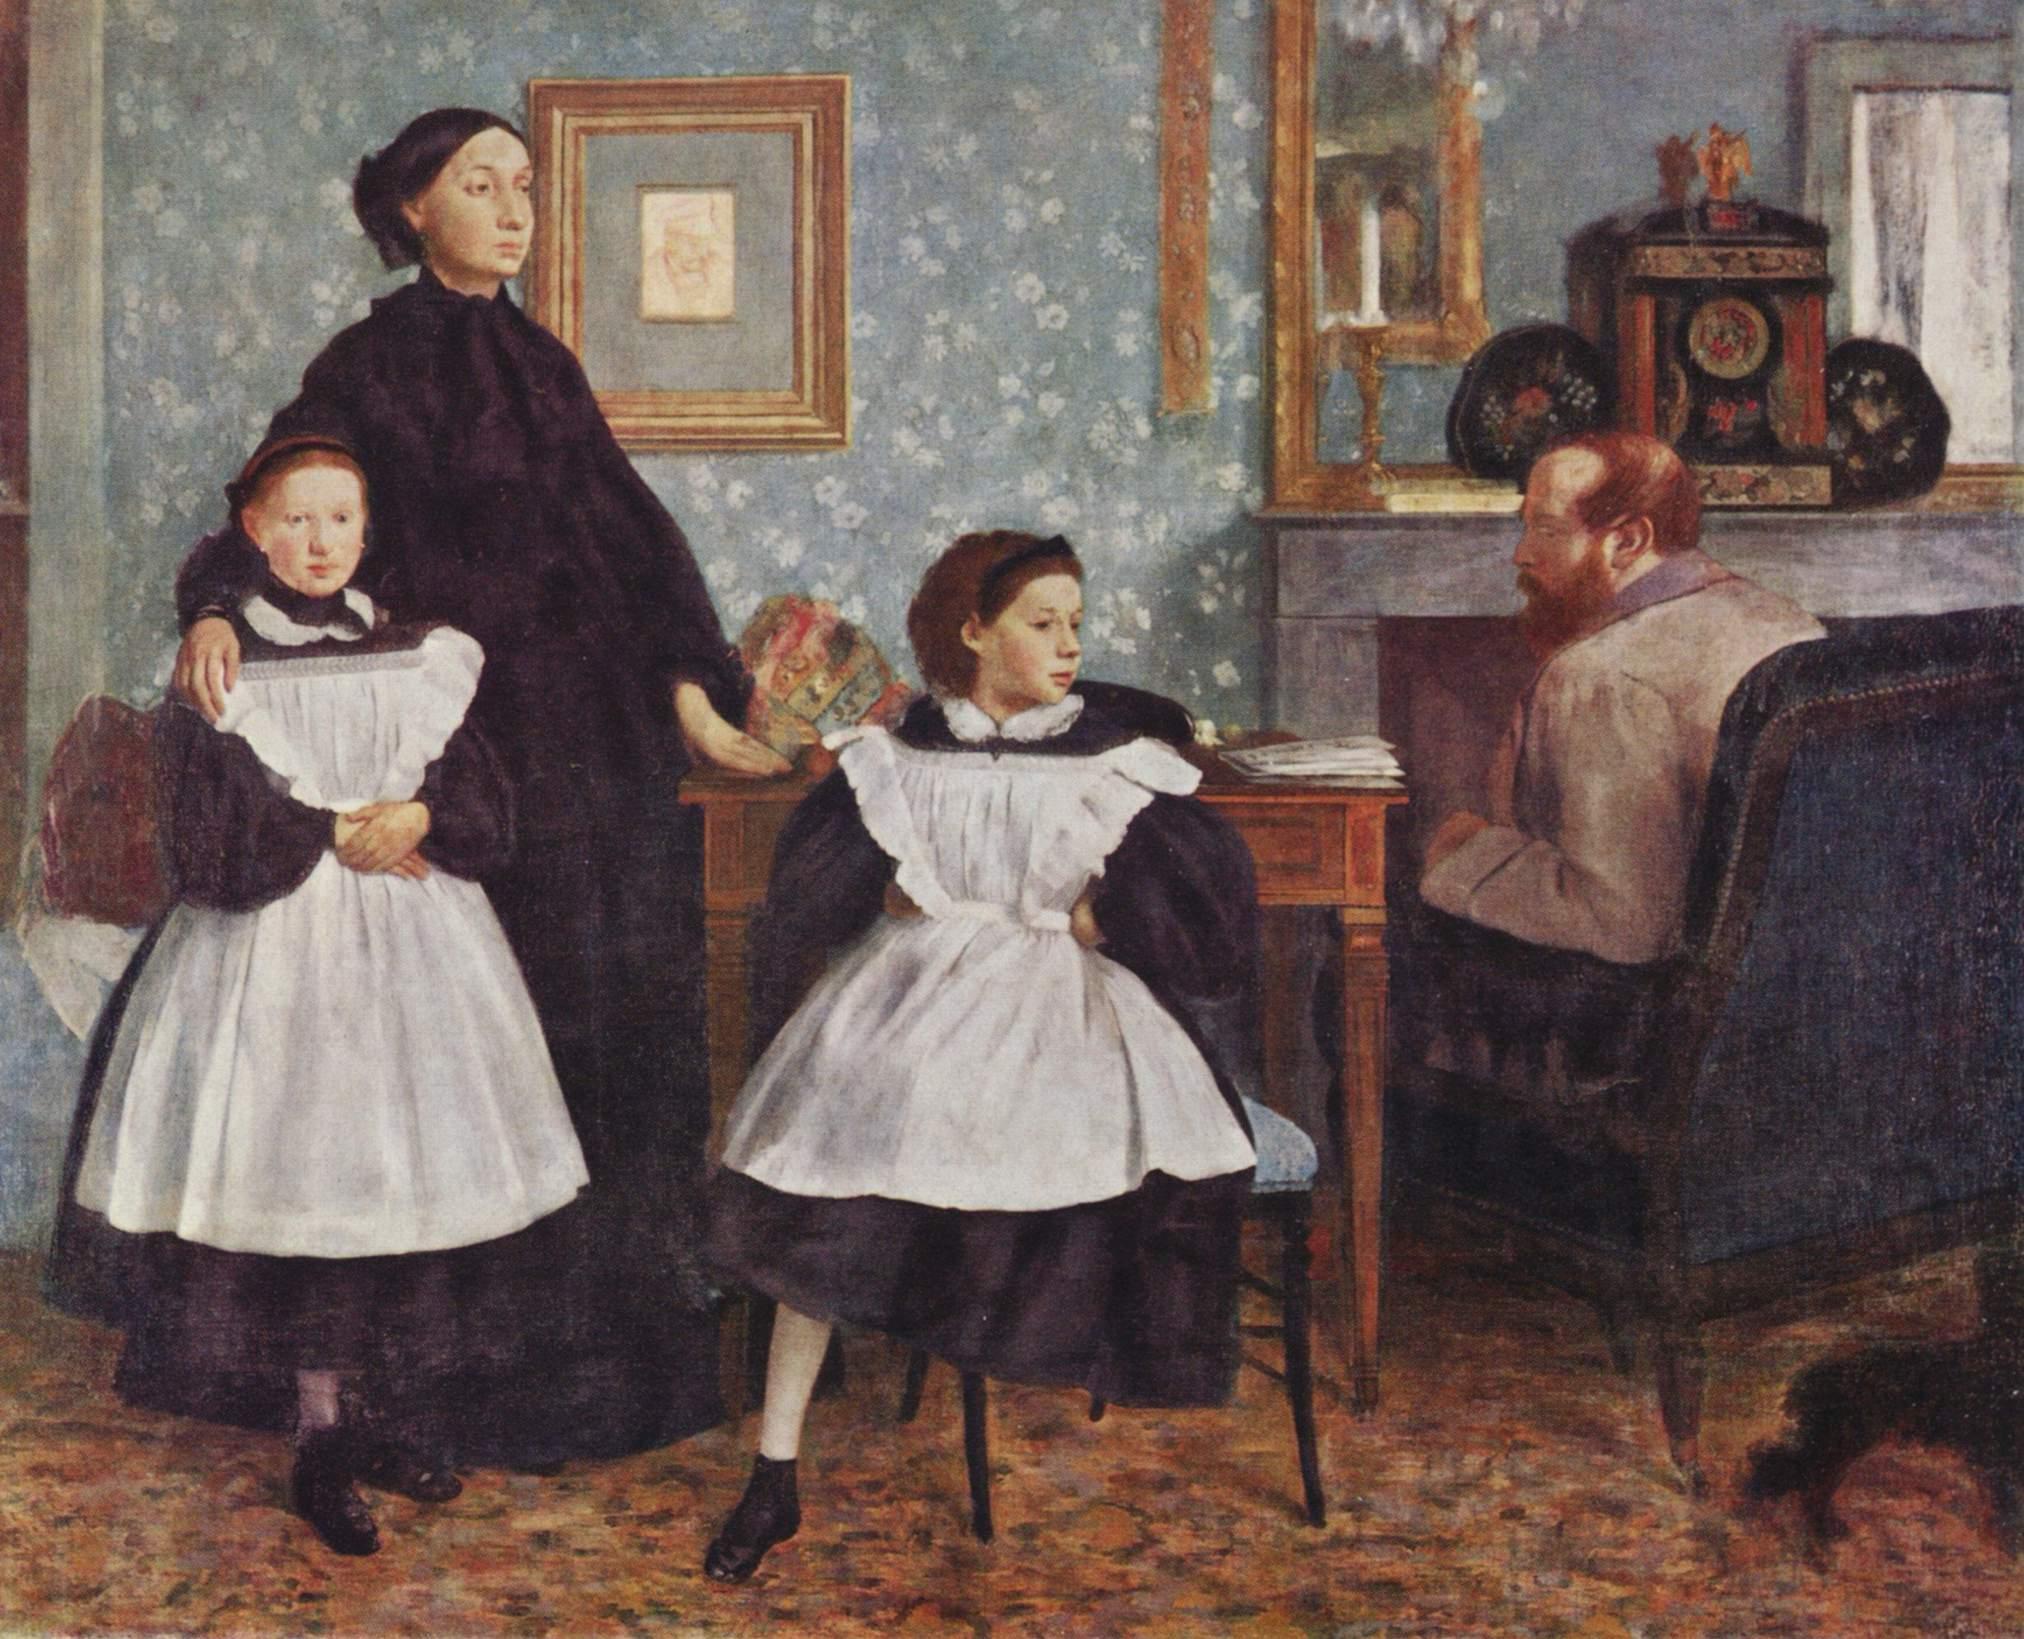 Портрет семьи Беллели, Эдгар-Жермен - Илер Дега